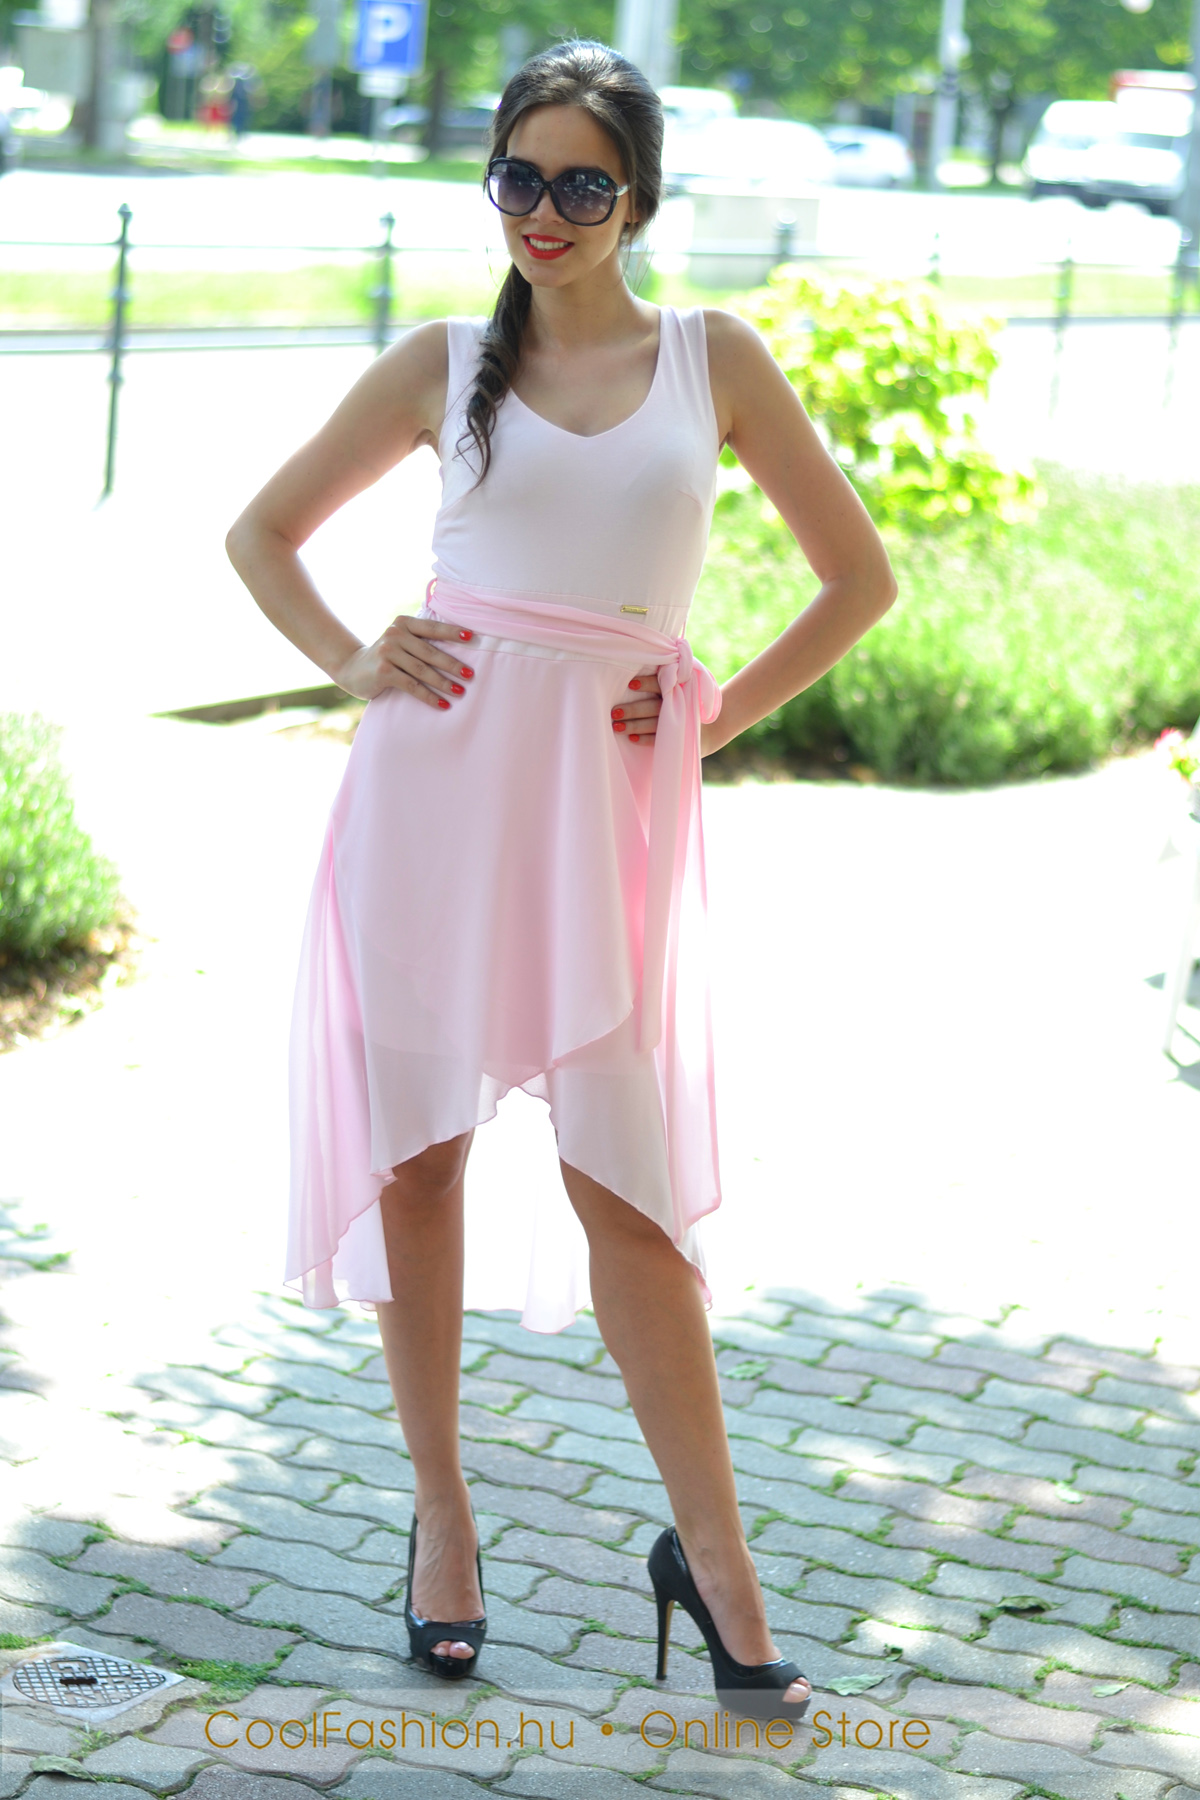 524b2738d6 Molli elől rövidebb maxi ruha - Cool Fashion